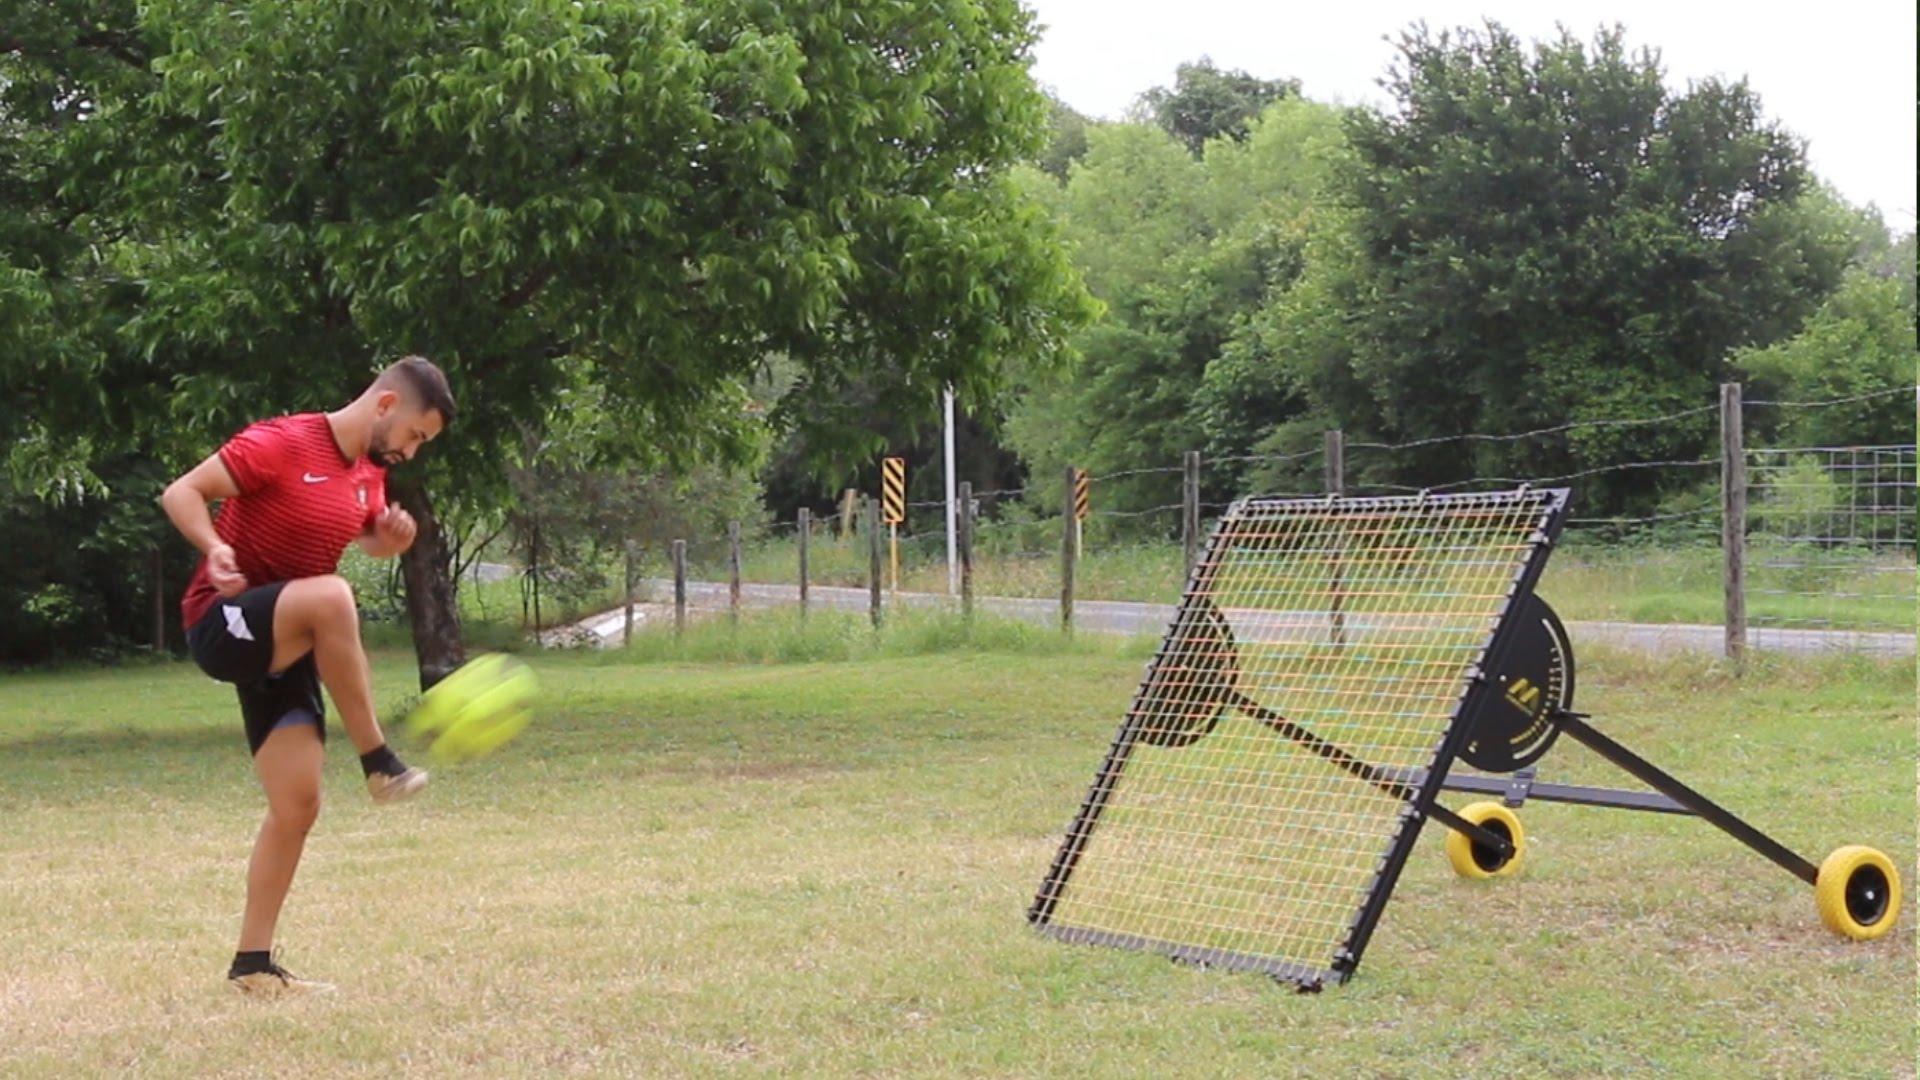 Professional Soccer Rebounder Drills